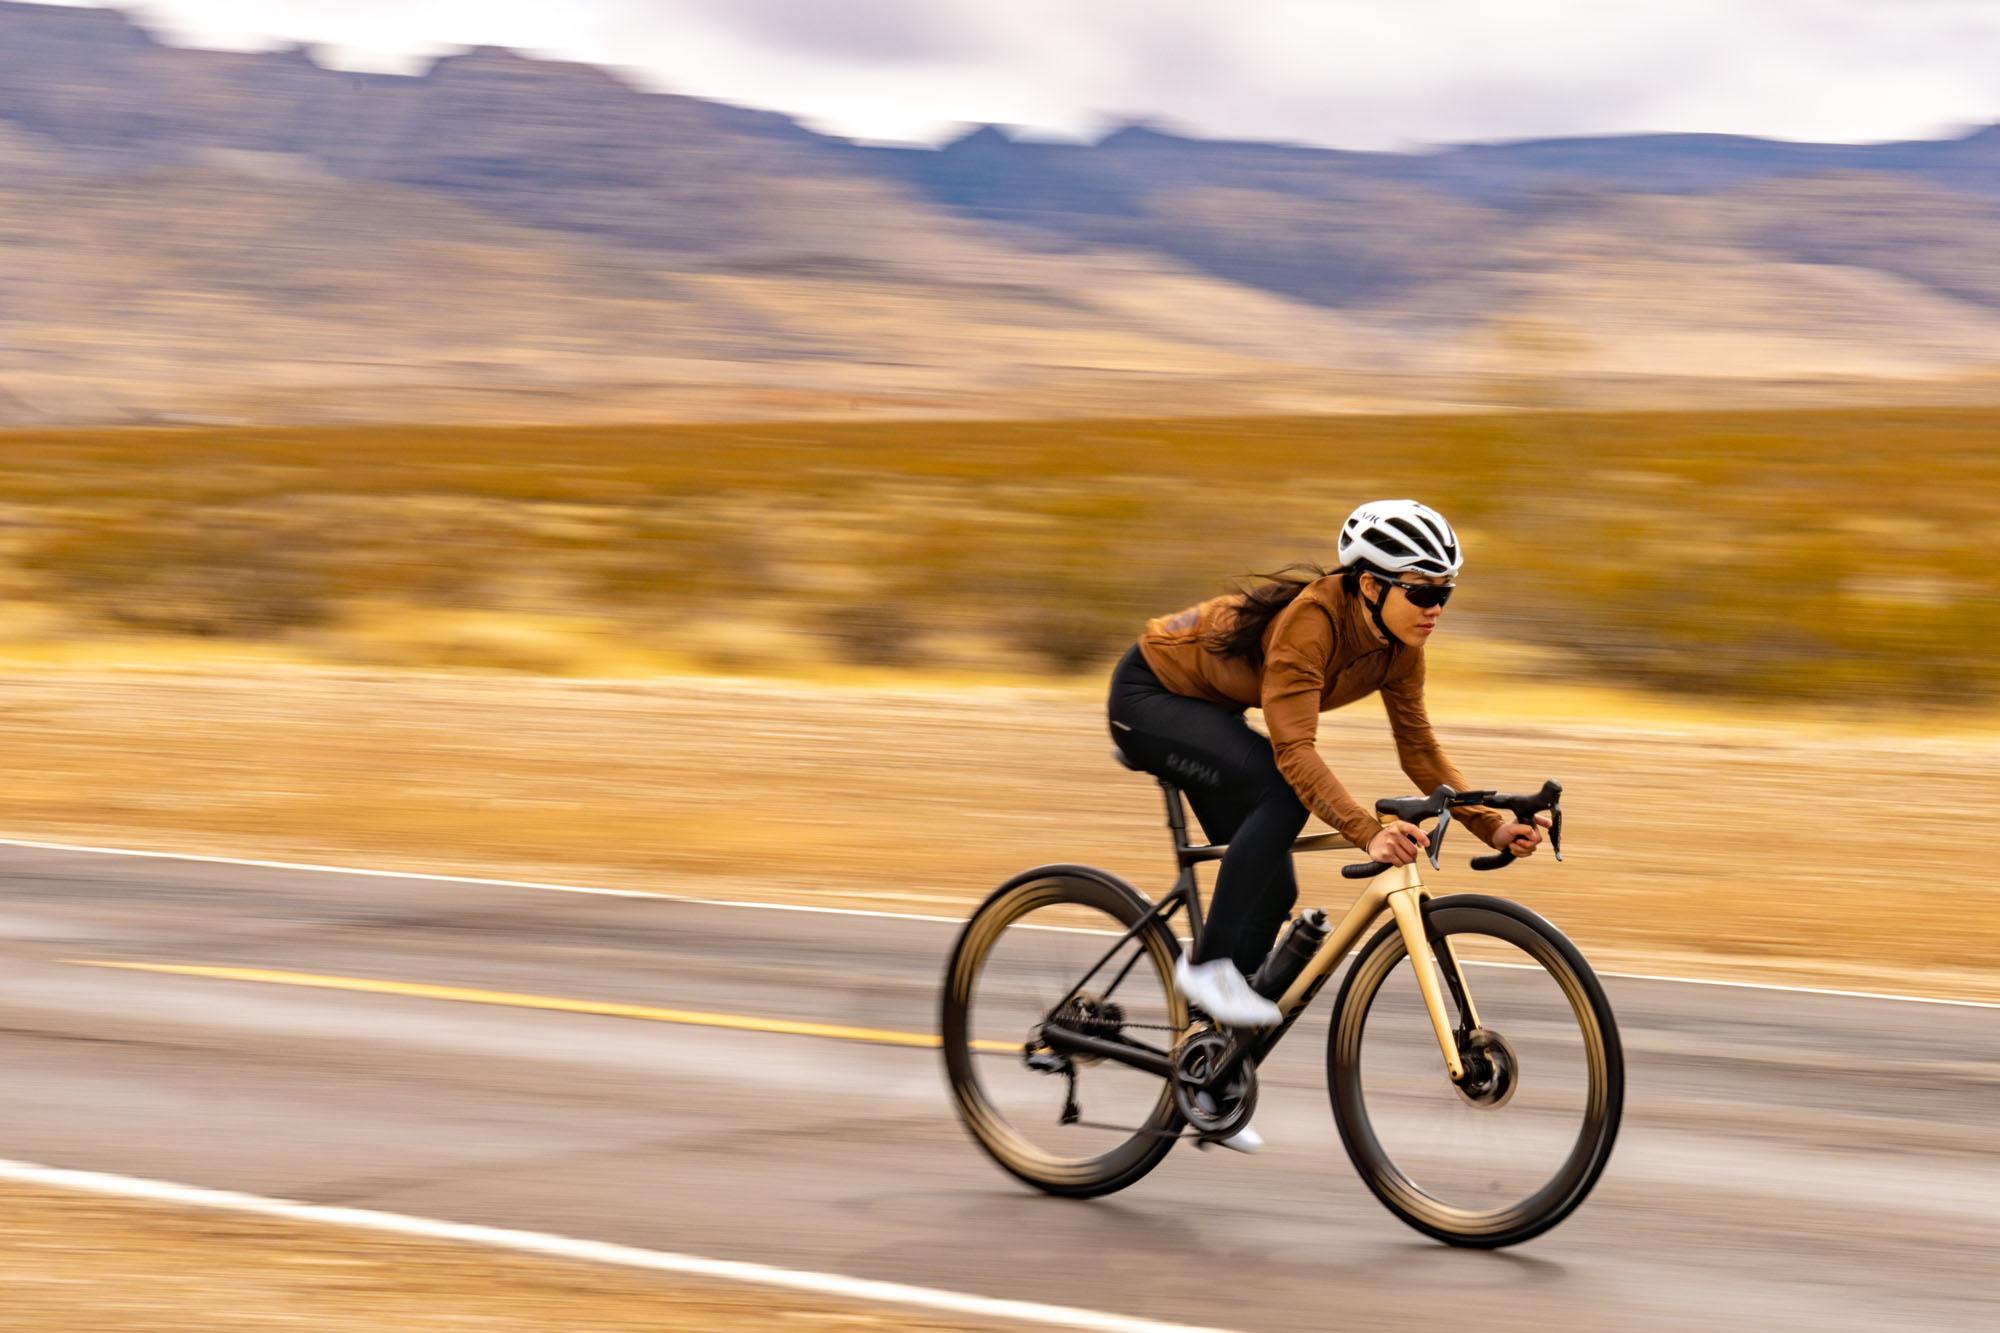 enve custom road riding